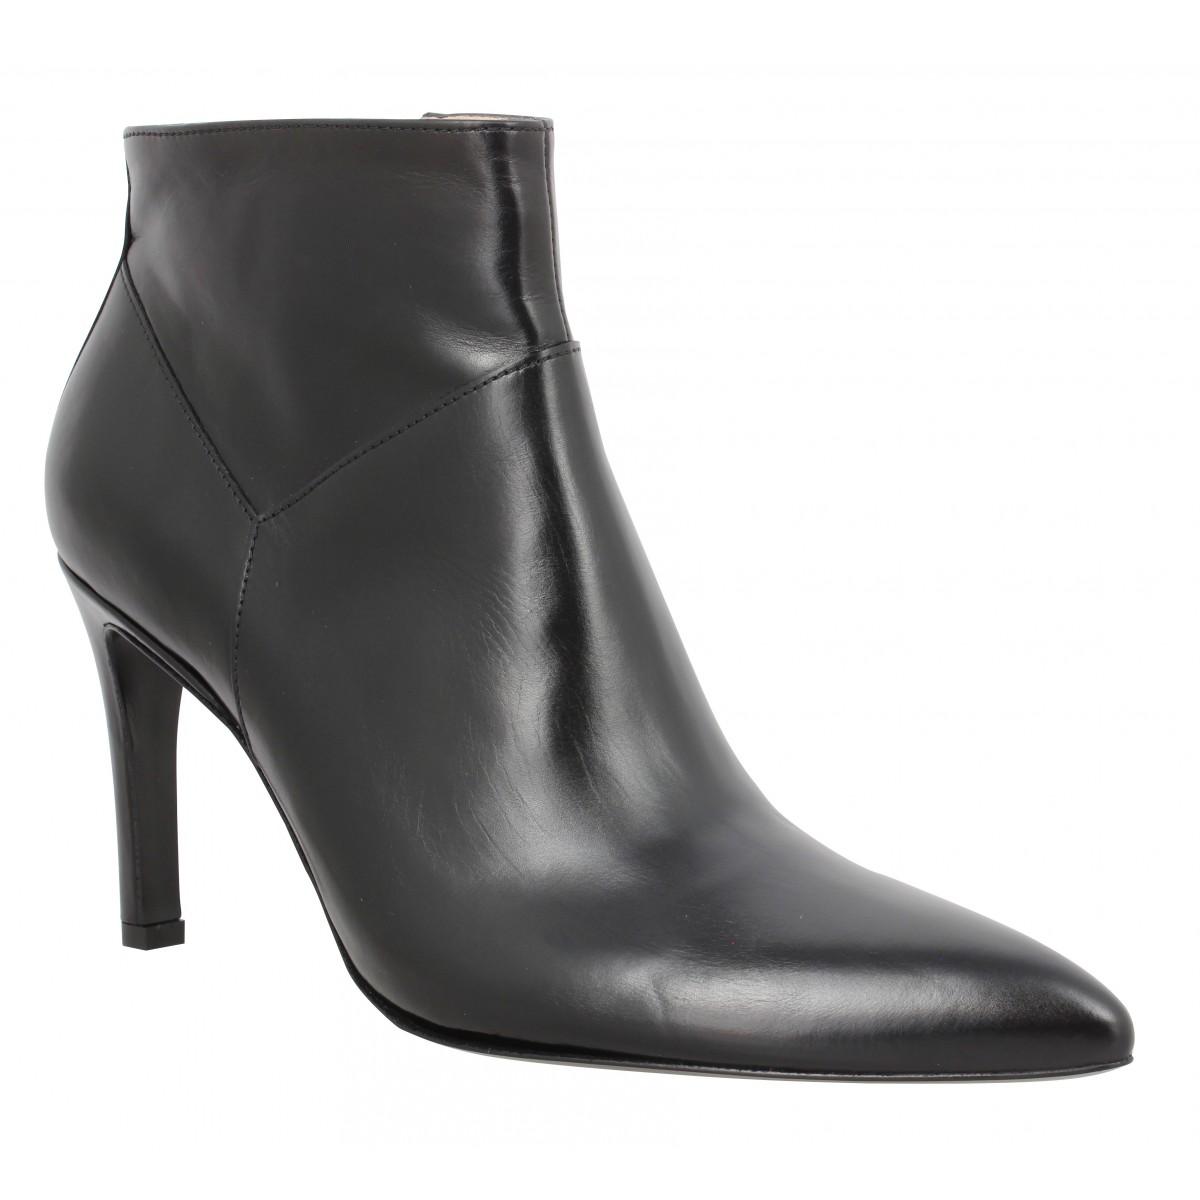 cuir Boot lisse Noir Zip FREE LANCE Forel Low 7 Femme NwO08nkPX